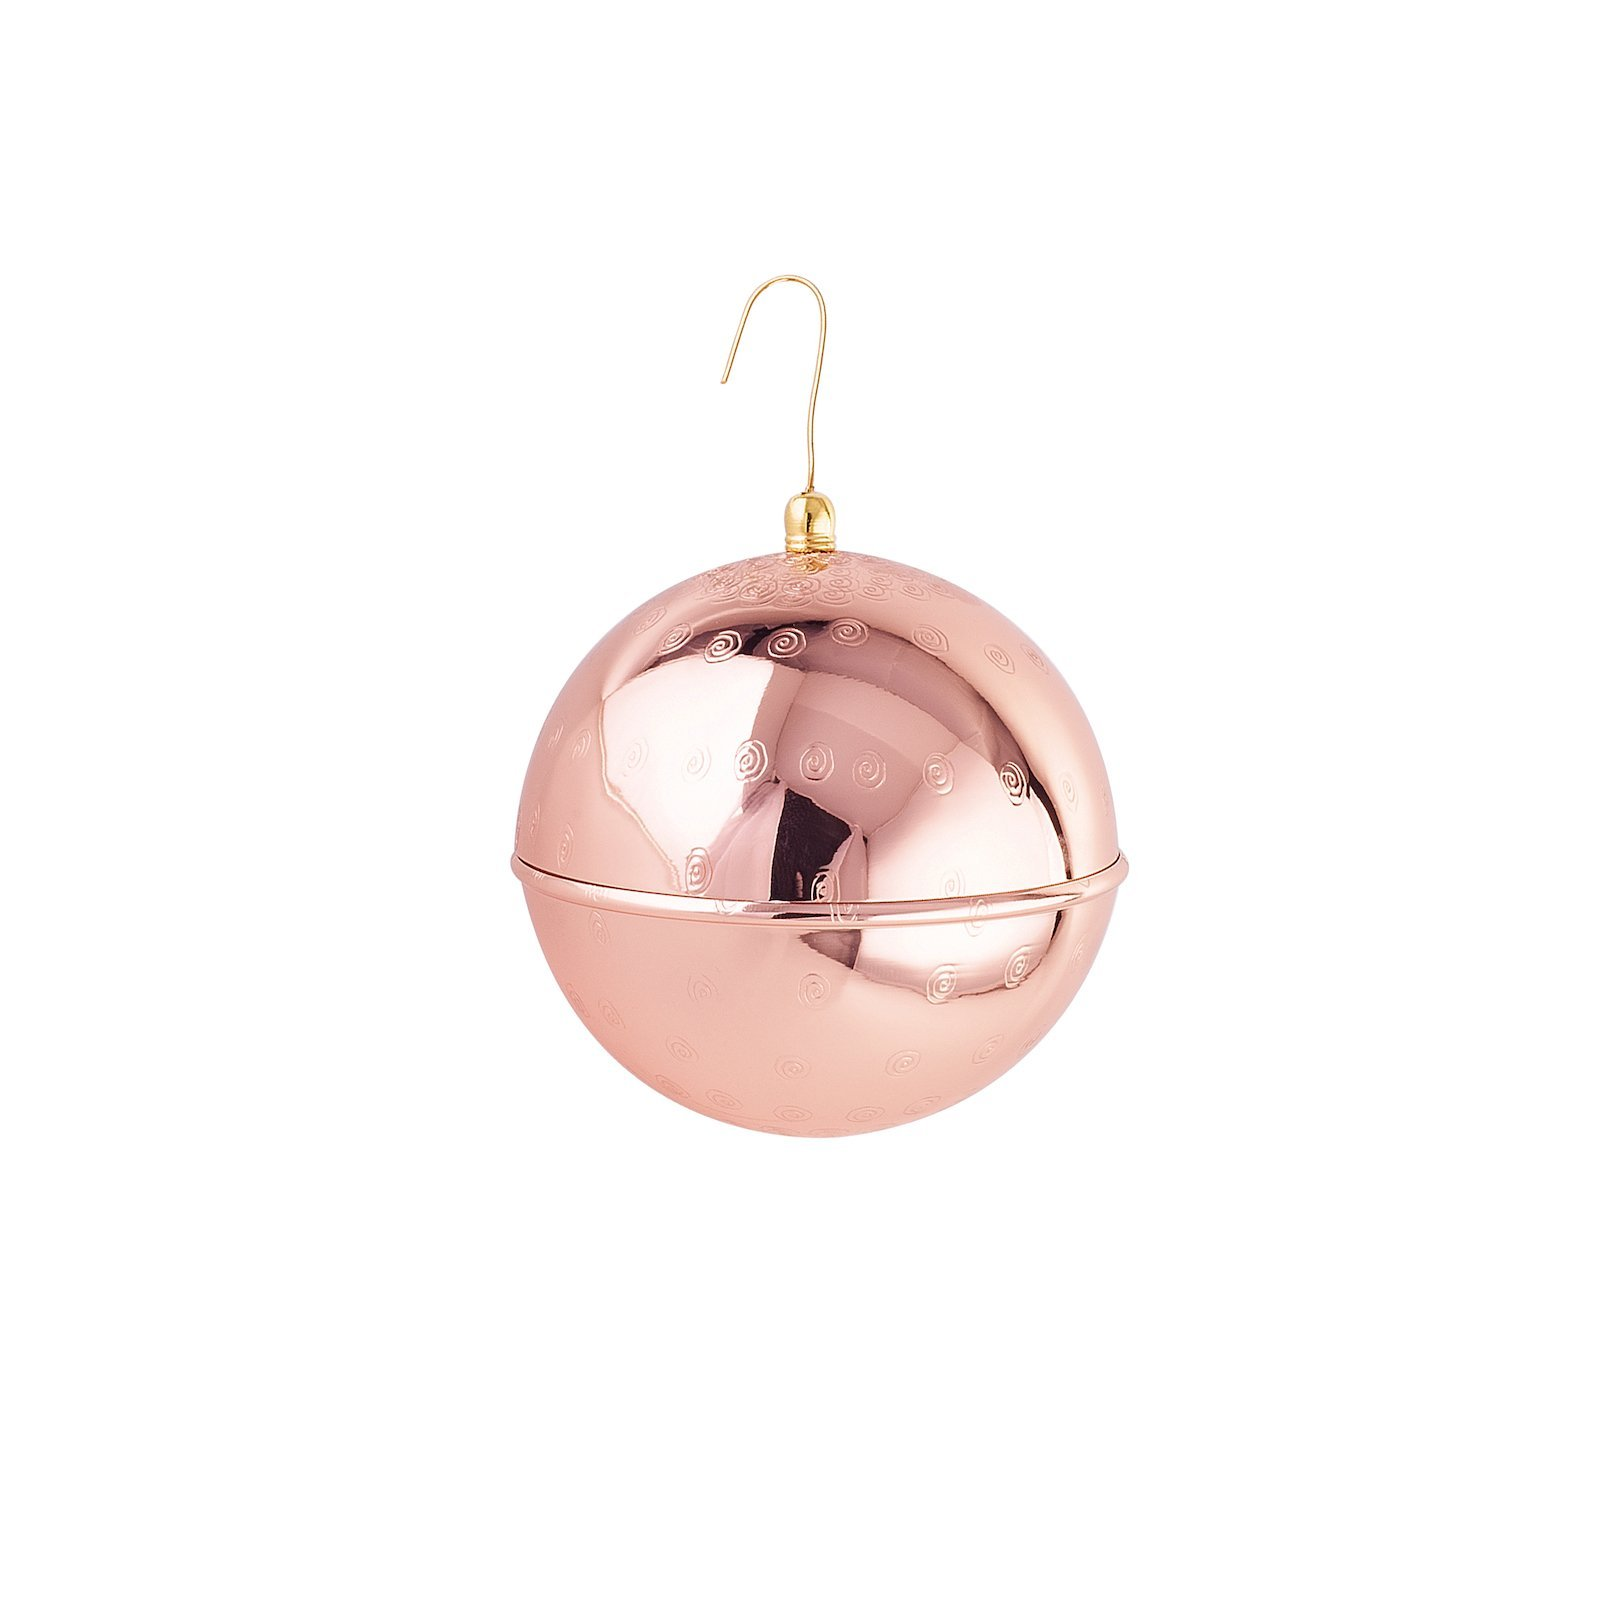 pallina-bronzo-zanetto-artigianale-natale-2019